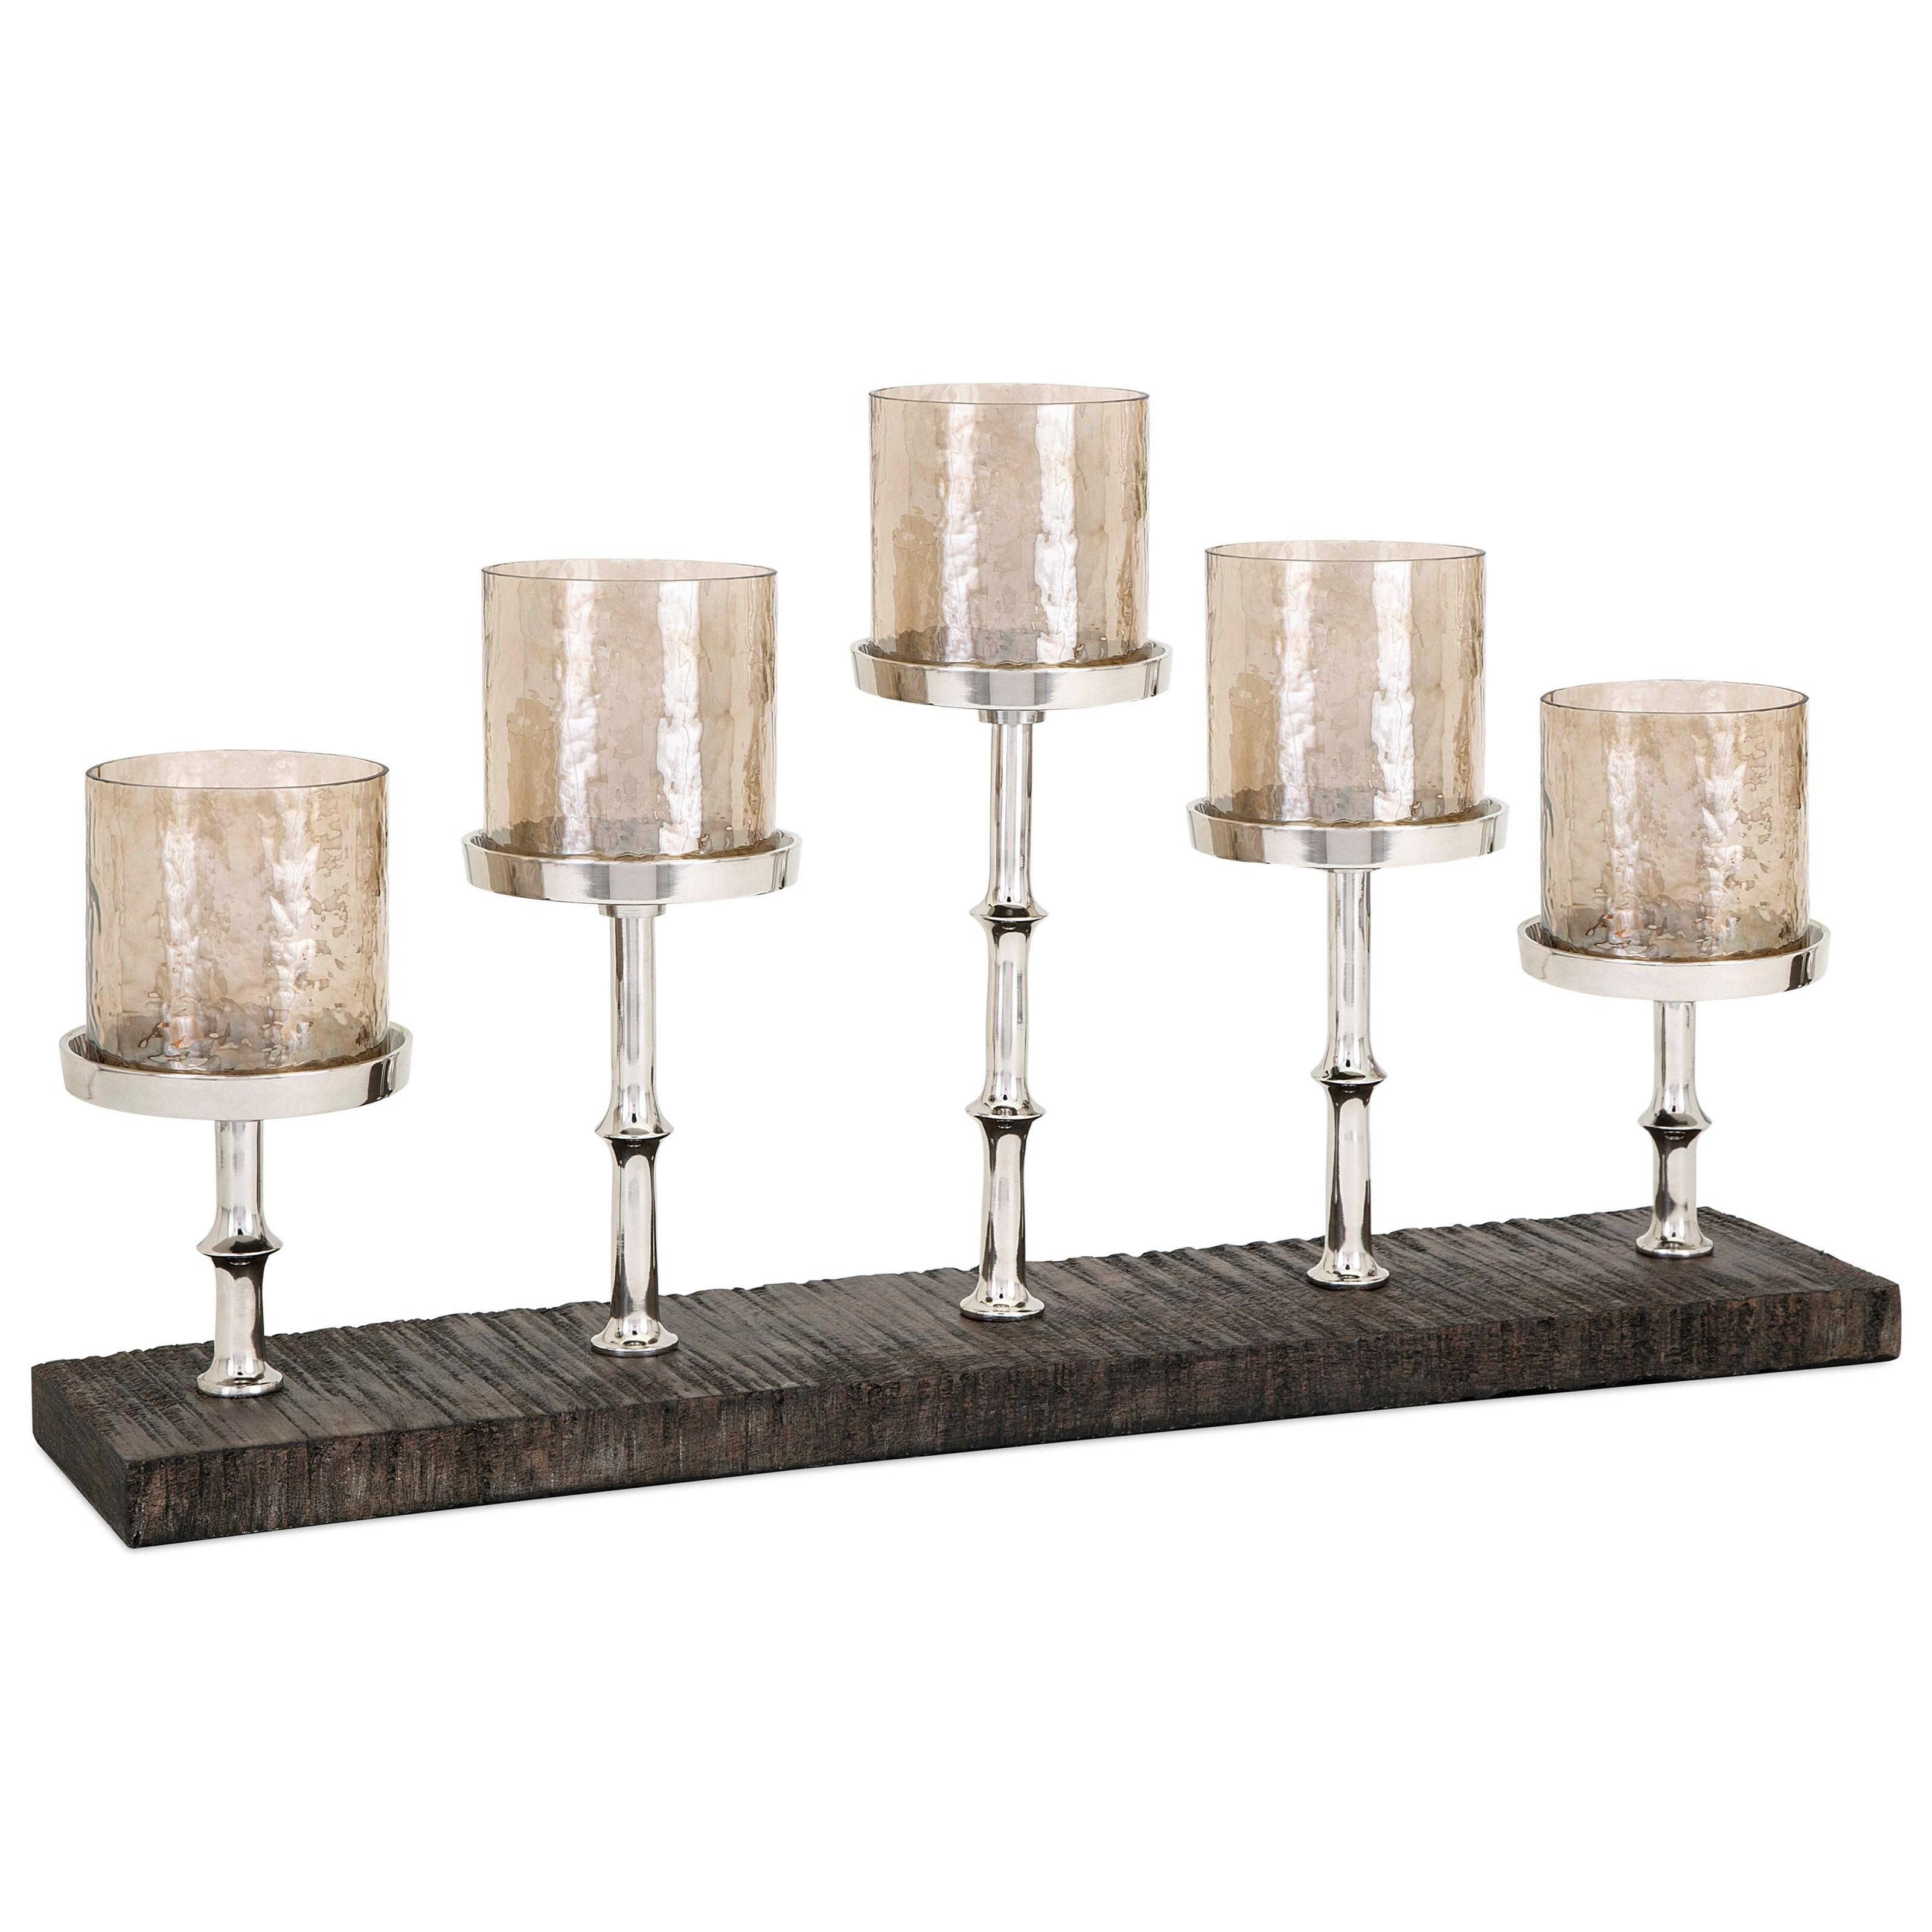 Pberon 5-Light Candleholder